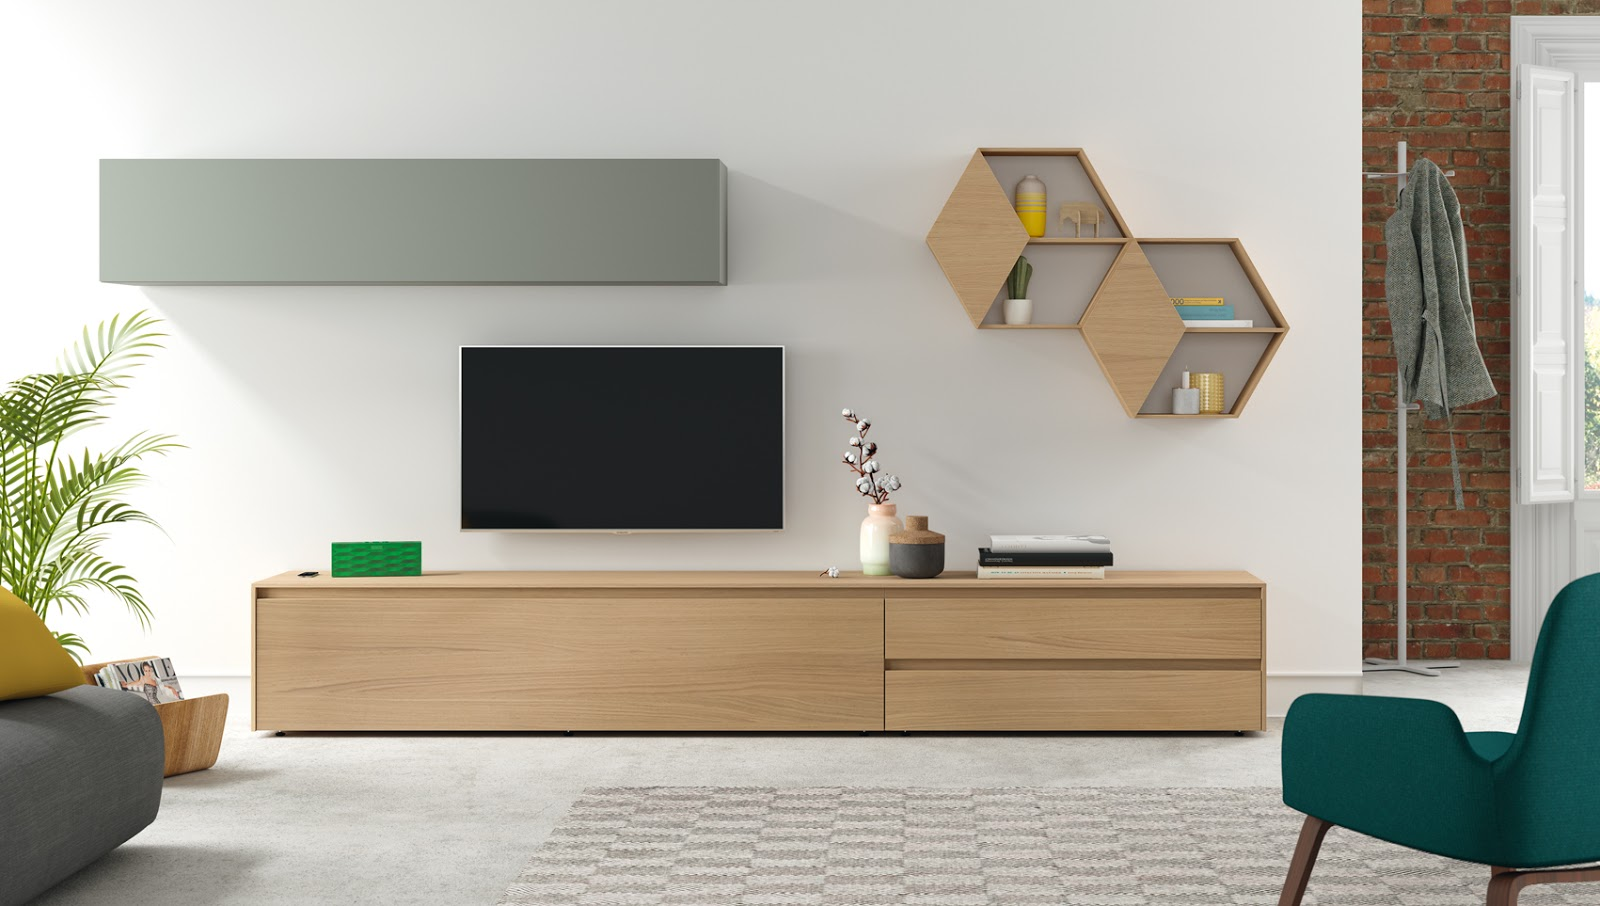 półki nad telewizorem